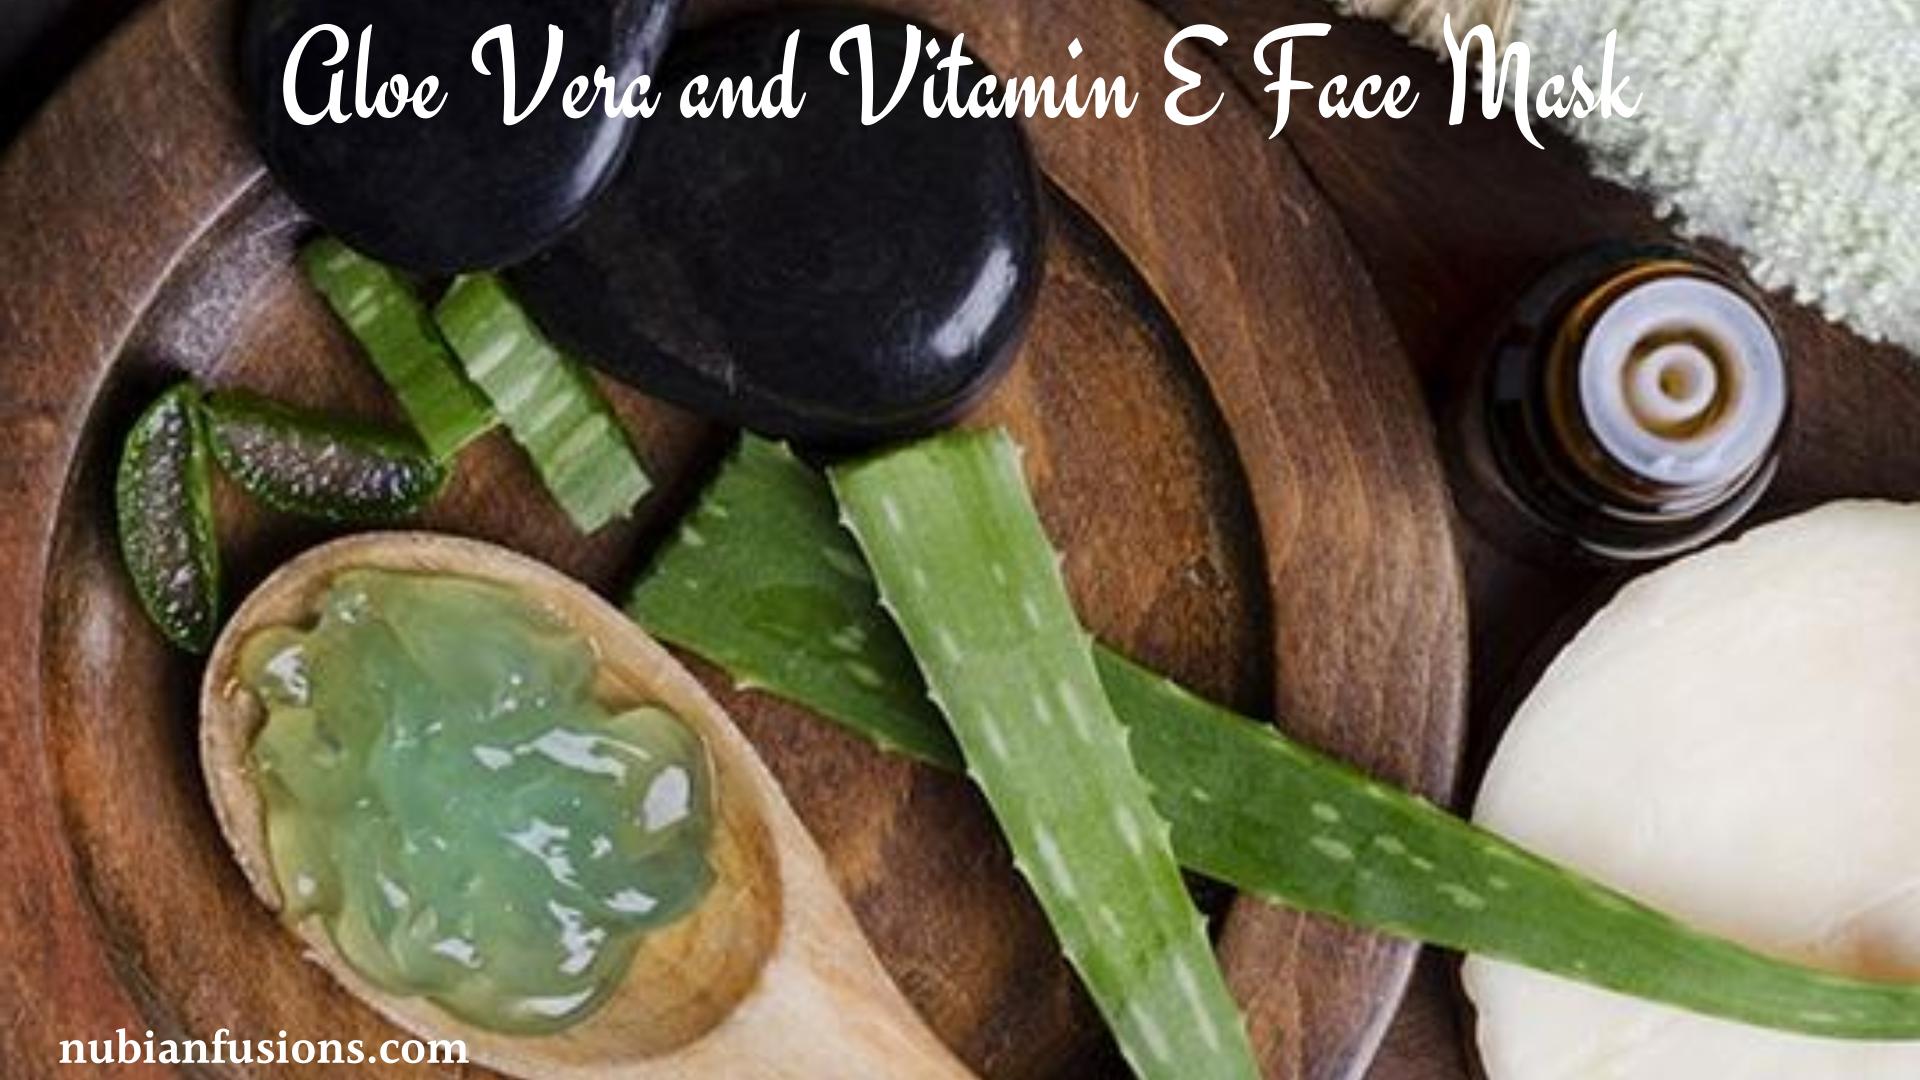 Aloe Vera and Vitamin E Face Mask